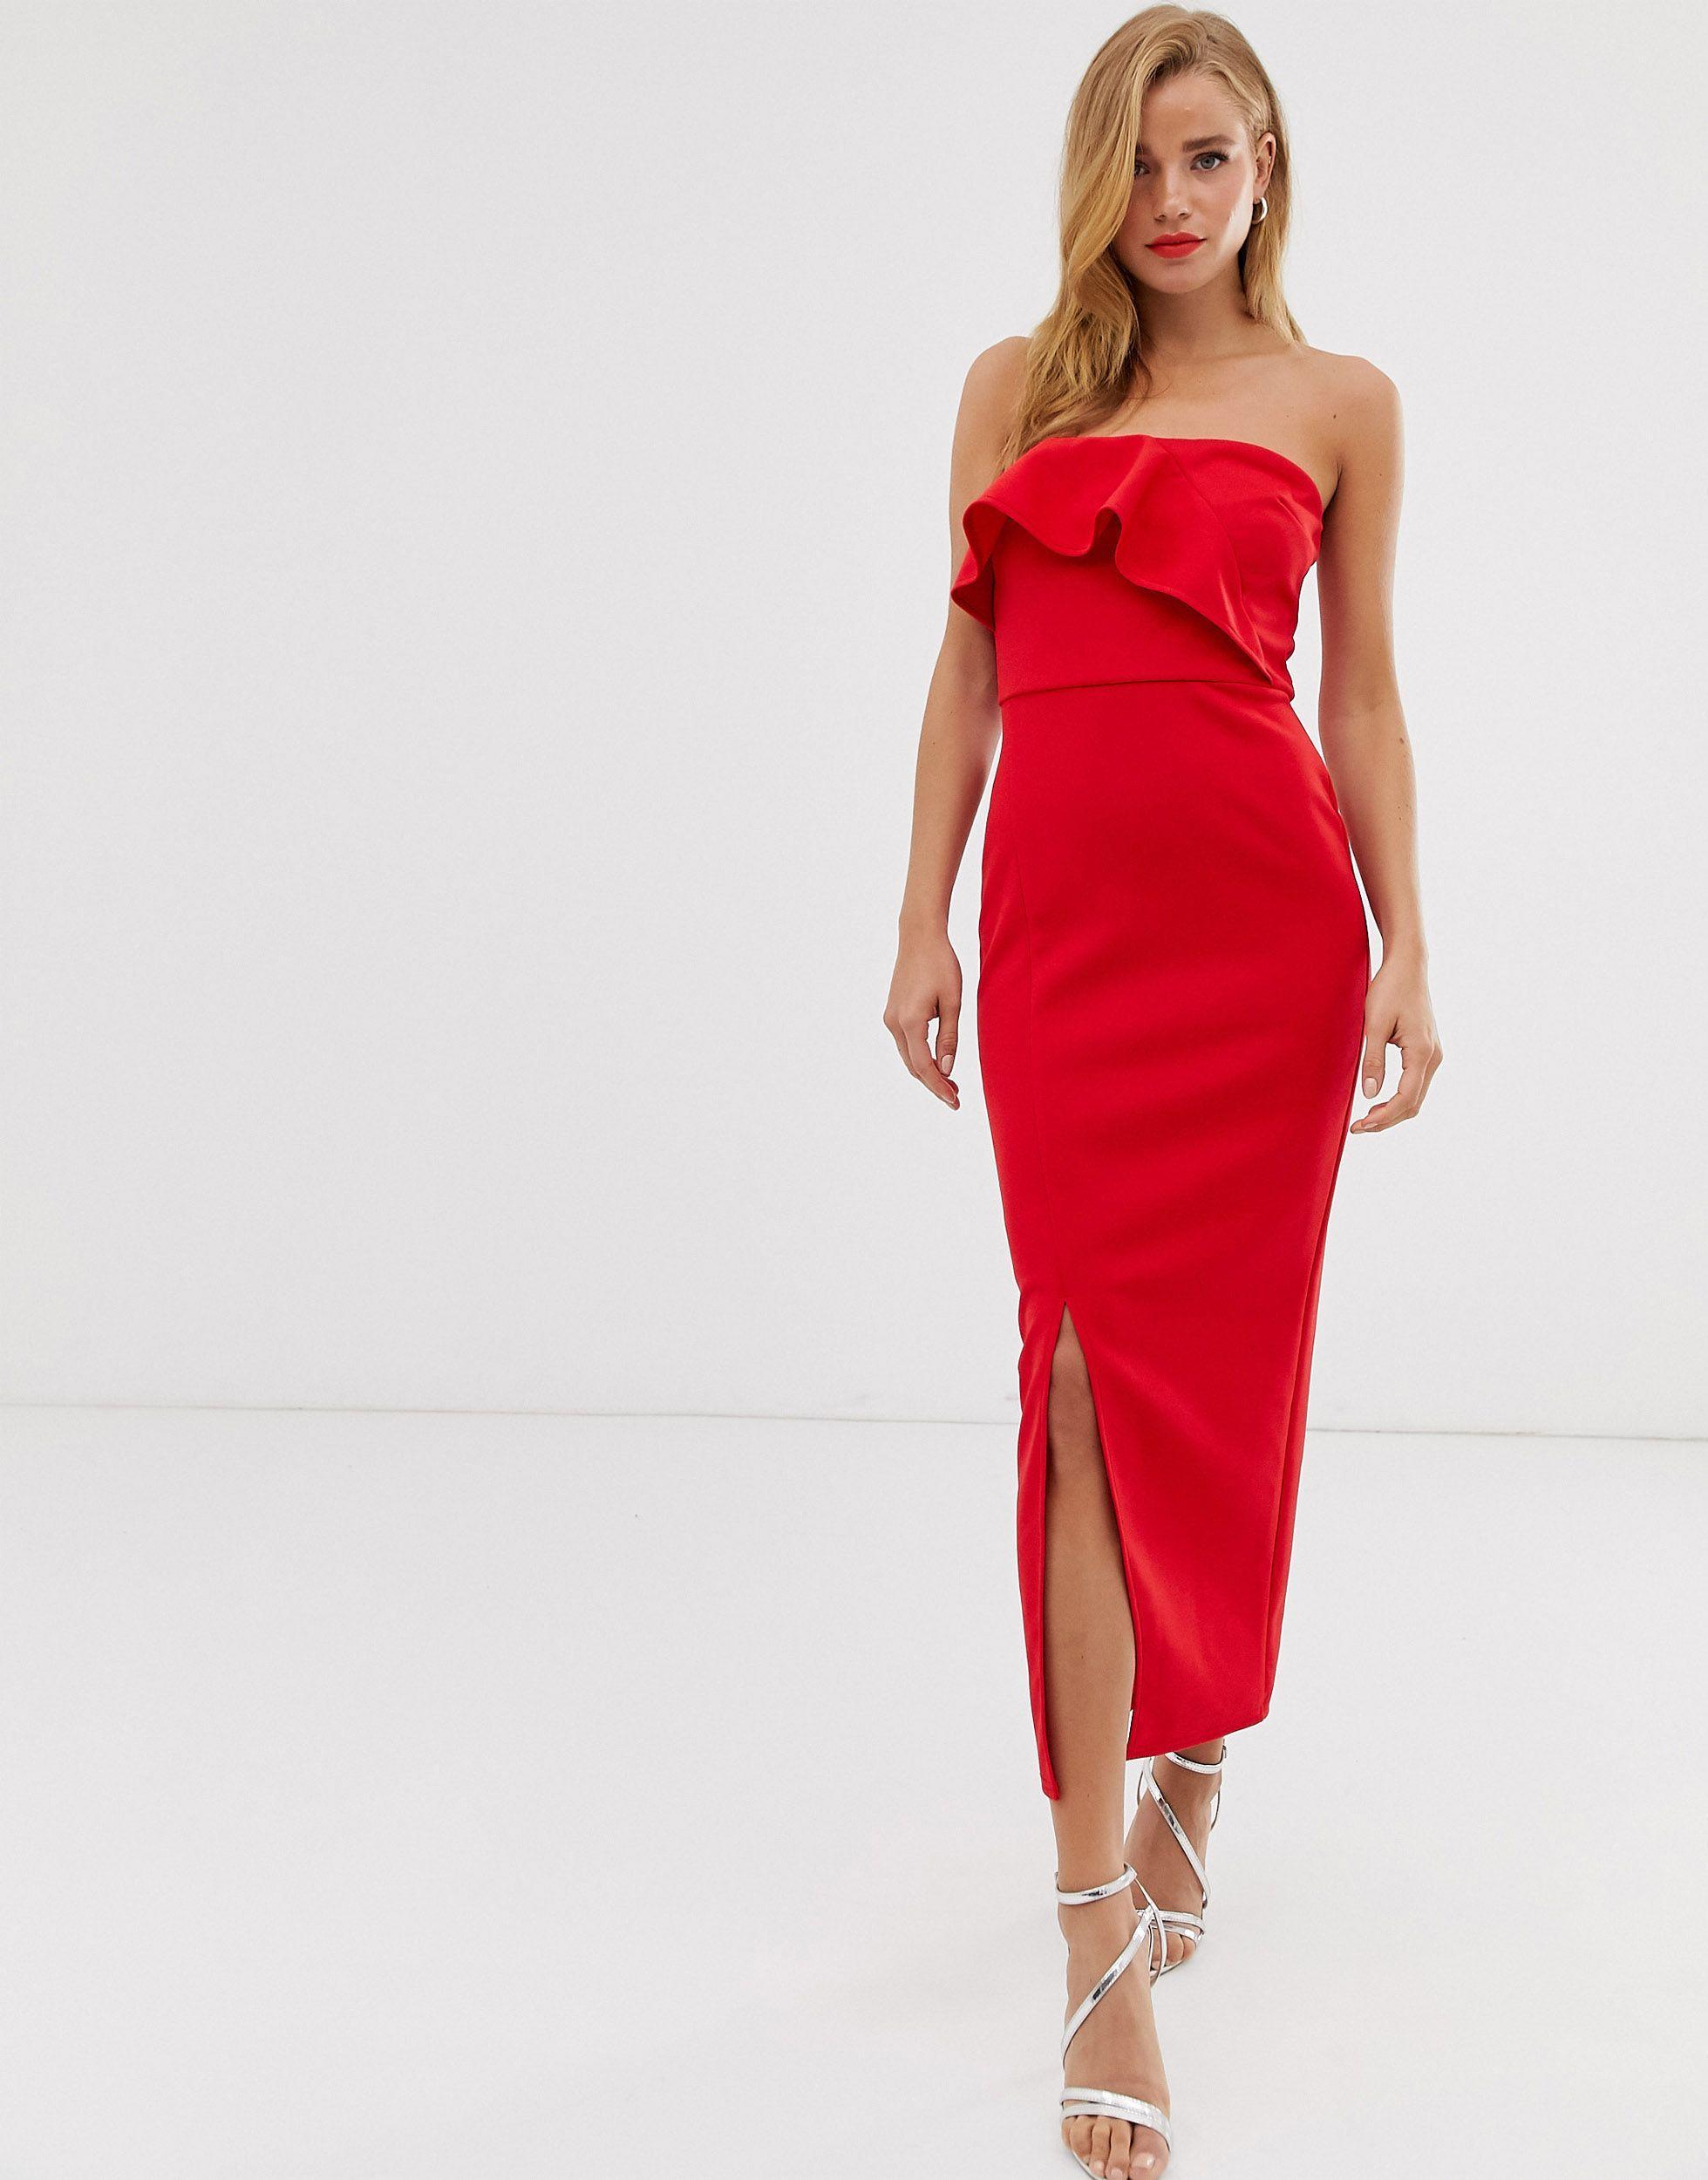 True Violet Women's Red Drape Frill Midaxi Dress